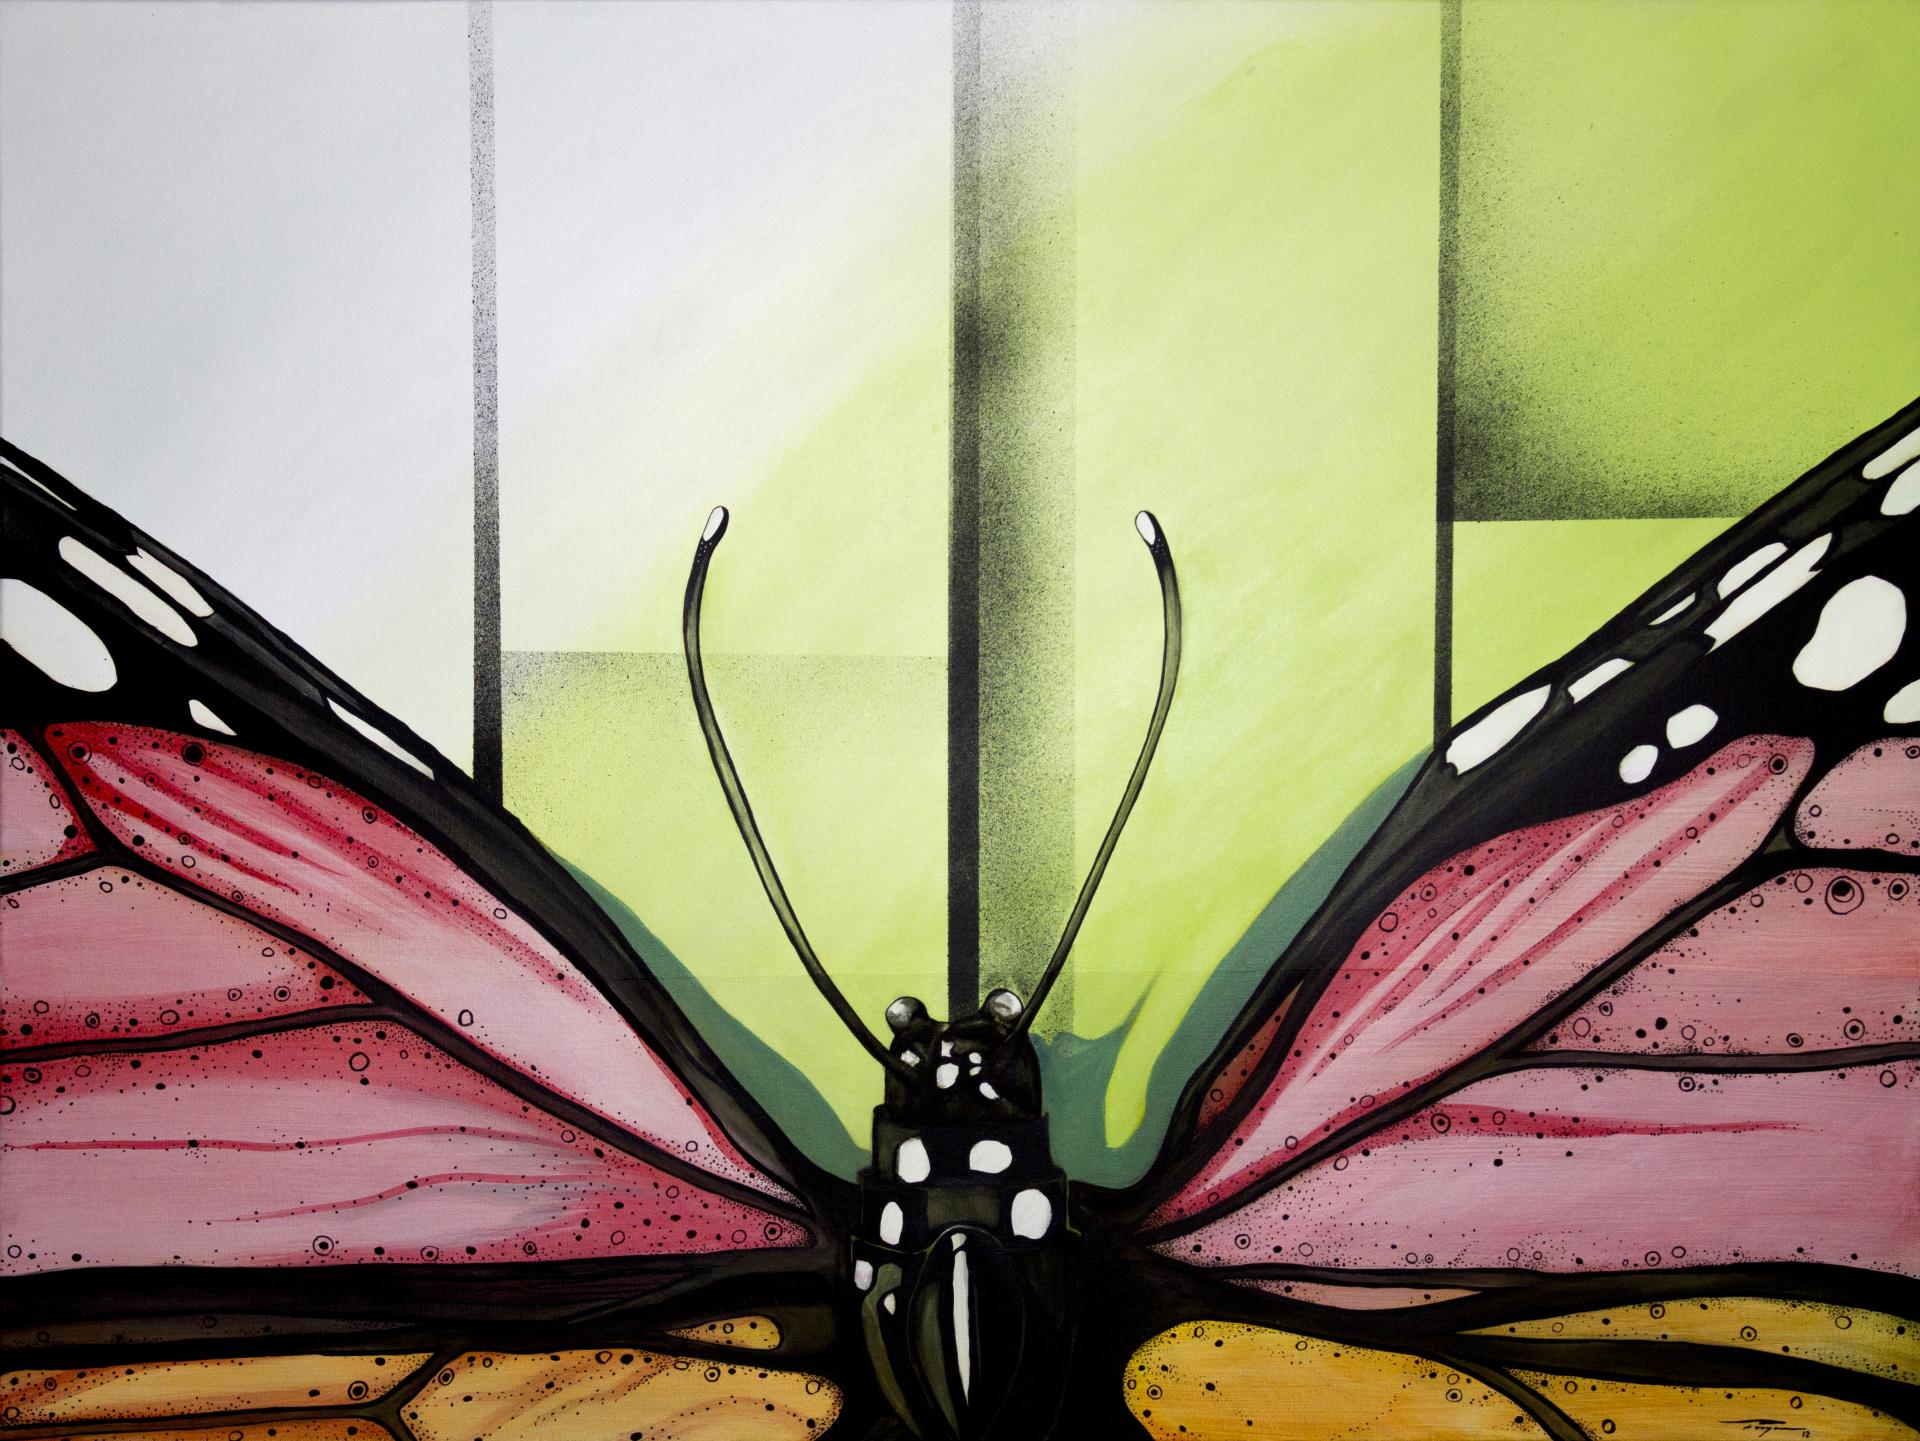 """Mariposa""  2012  48""x 36"" Acrylic on canvas   Price: $10,000"